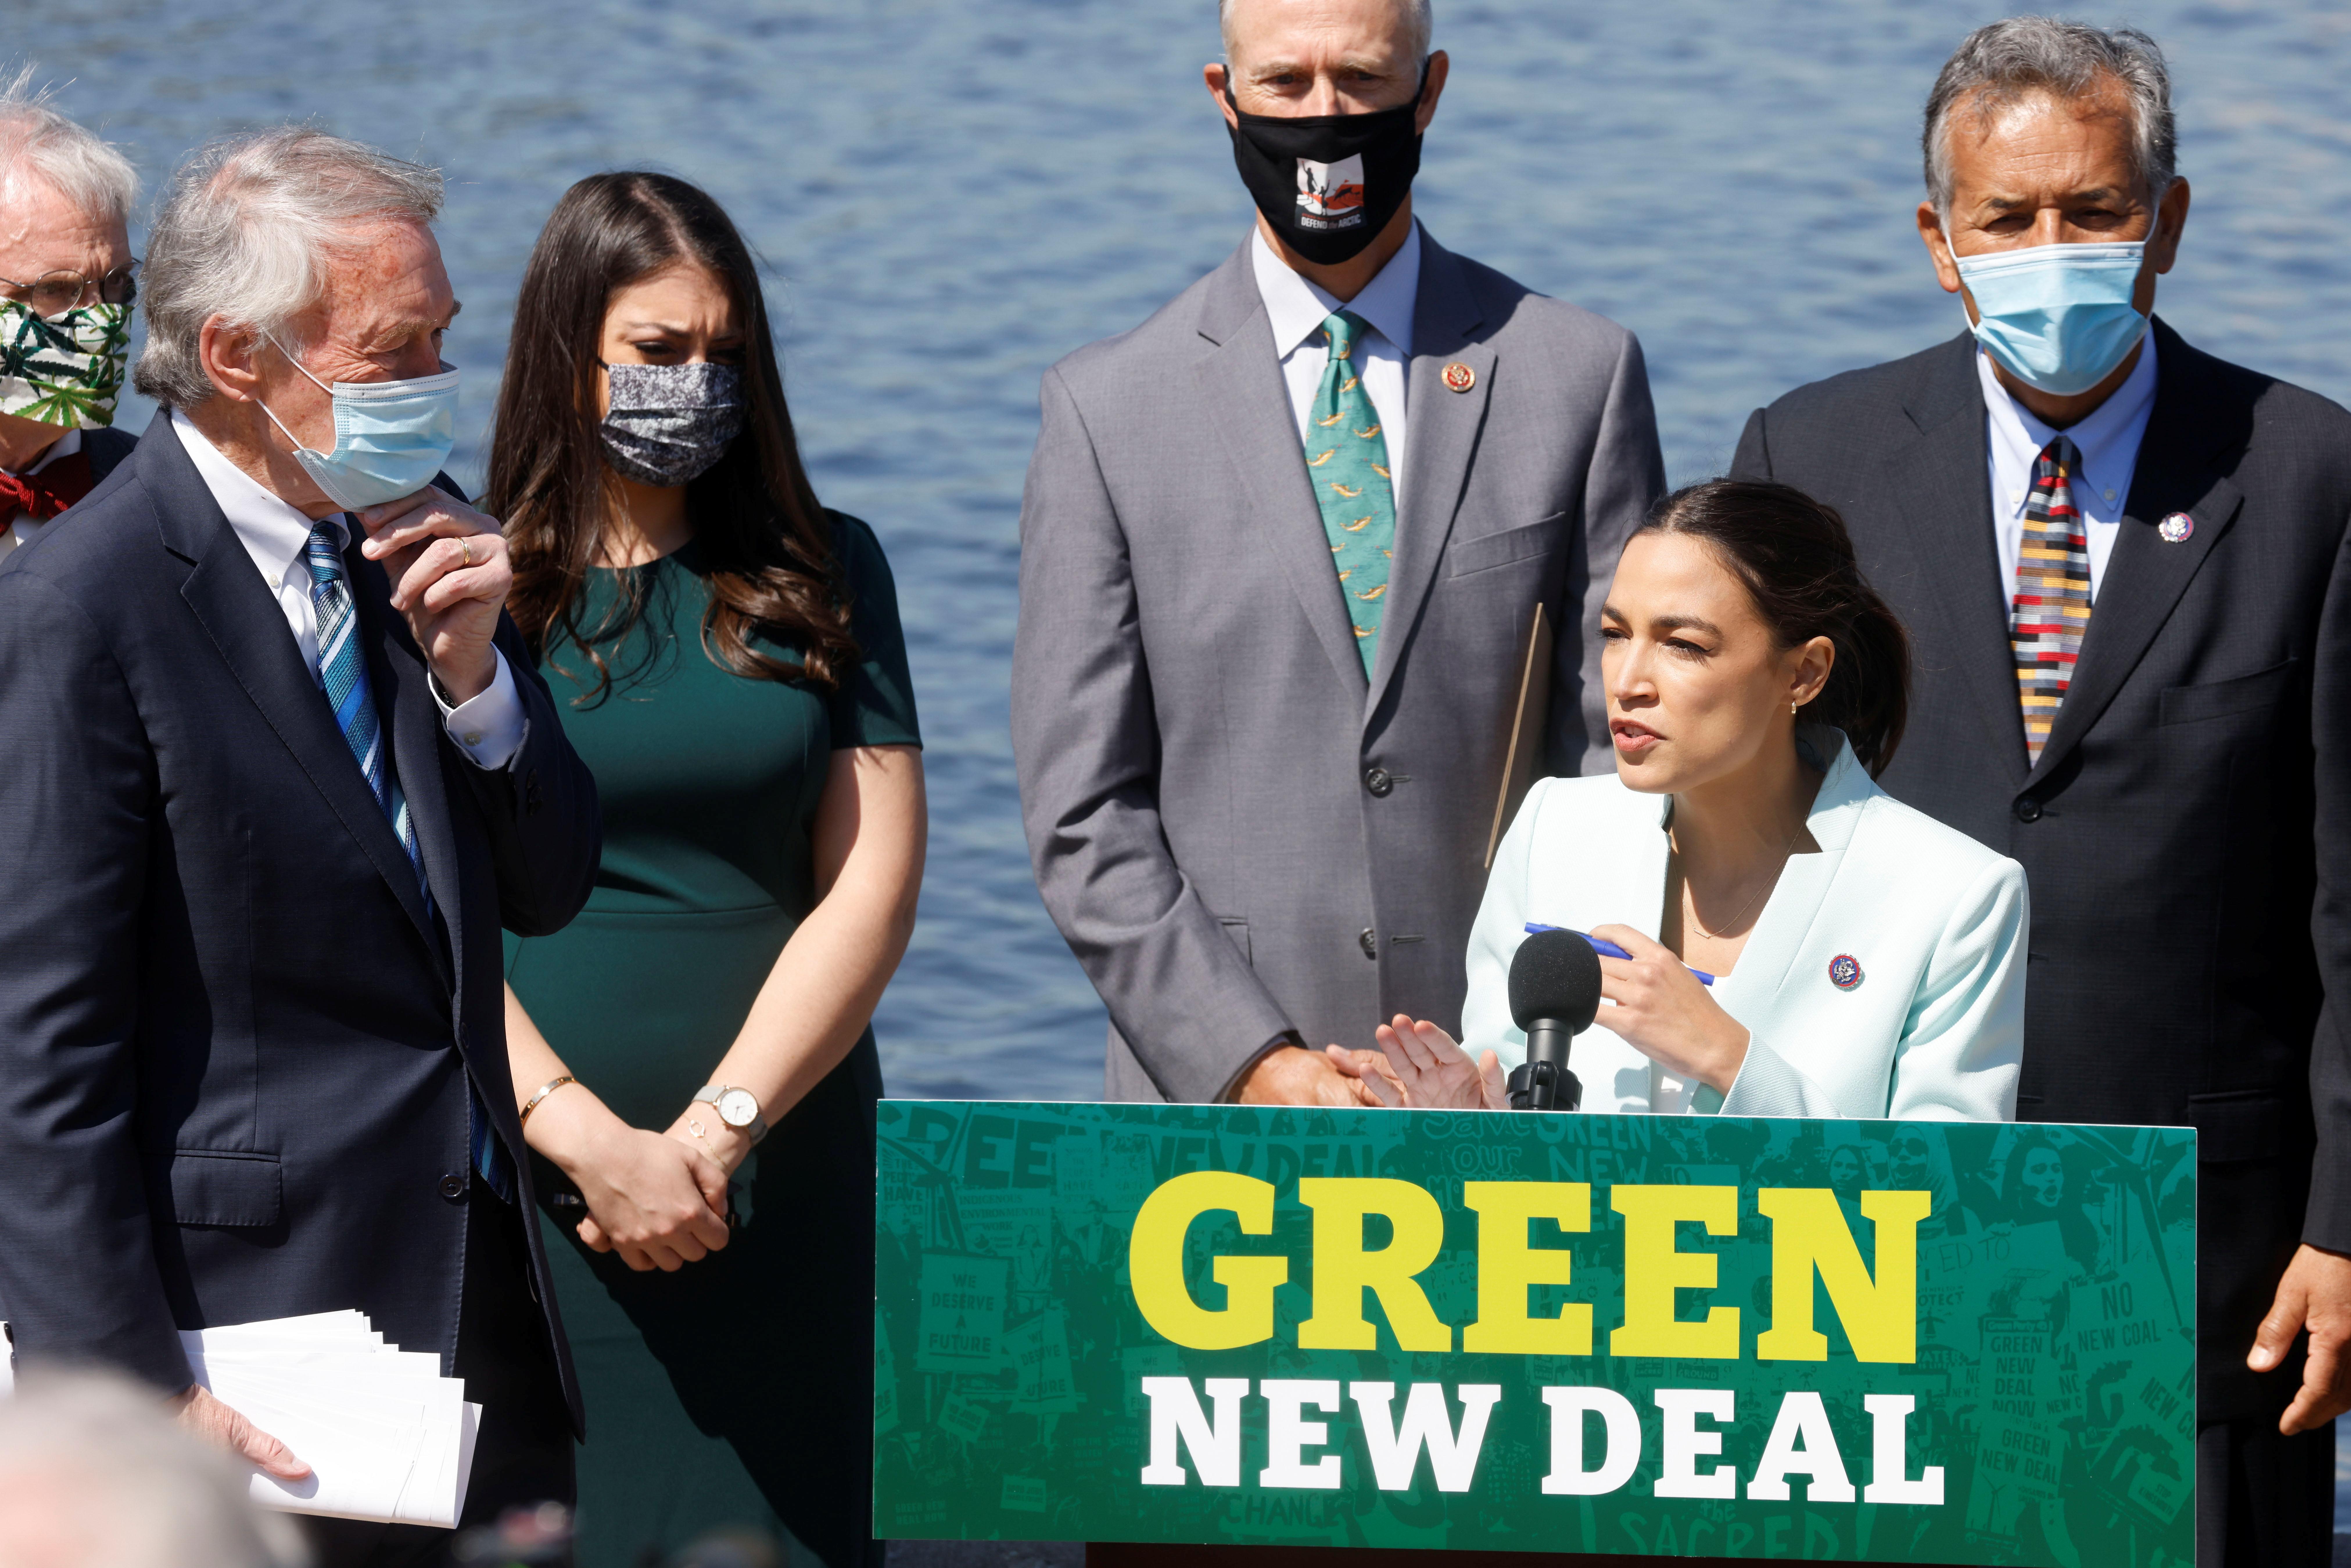 U.S. Rep. Alexandria Ocasio-Cortez speaks as she and fellow Democraic lawmakers relaunch their